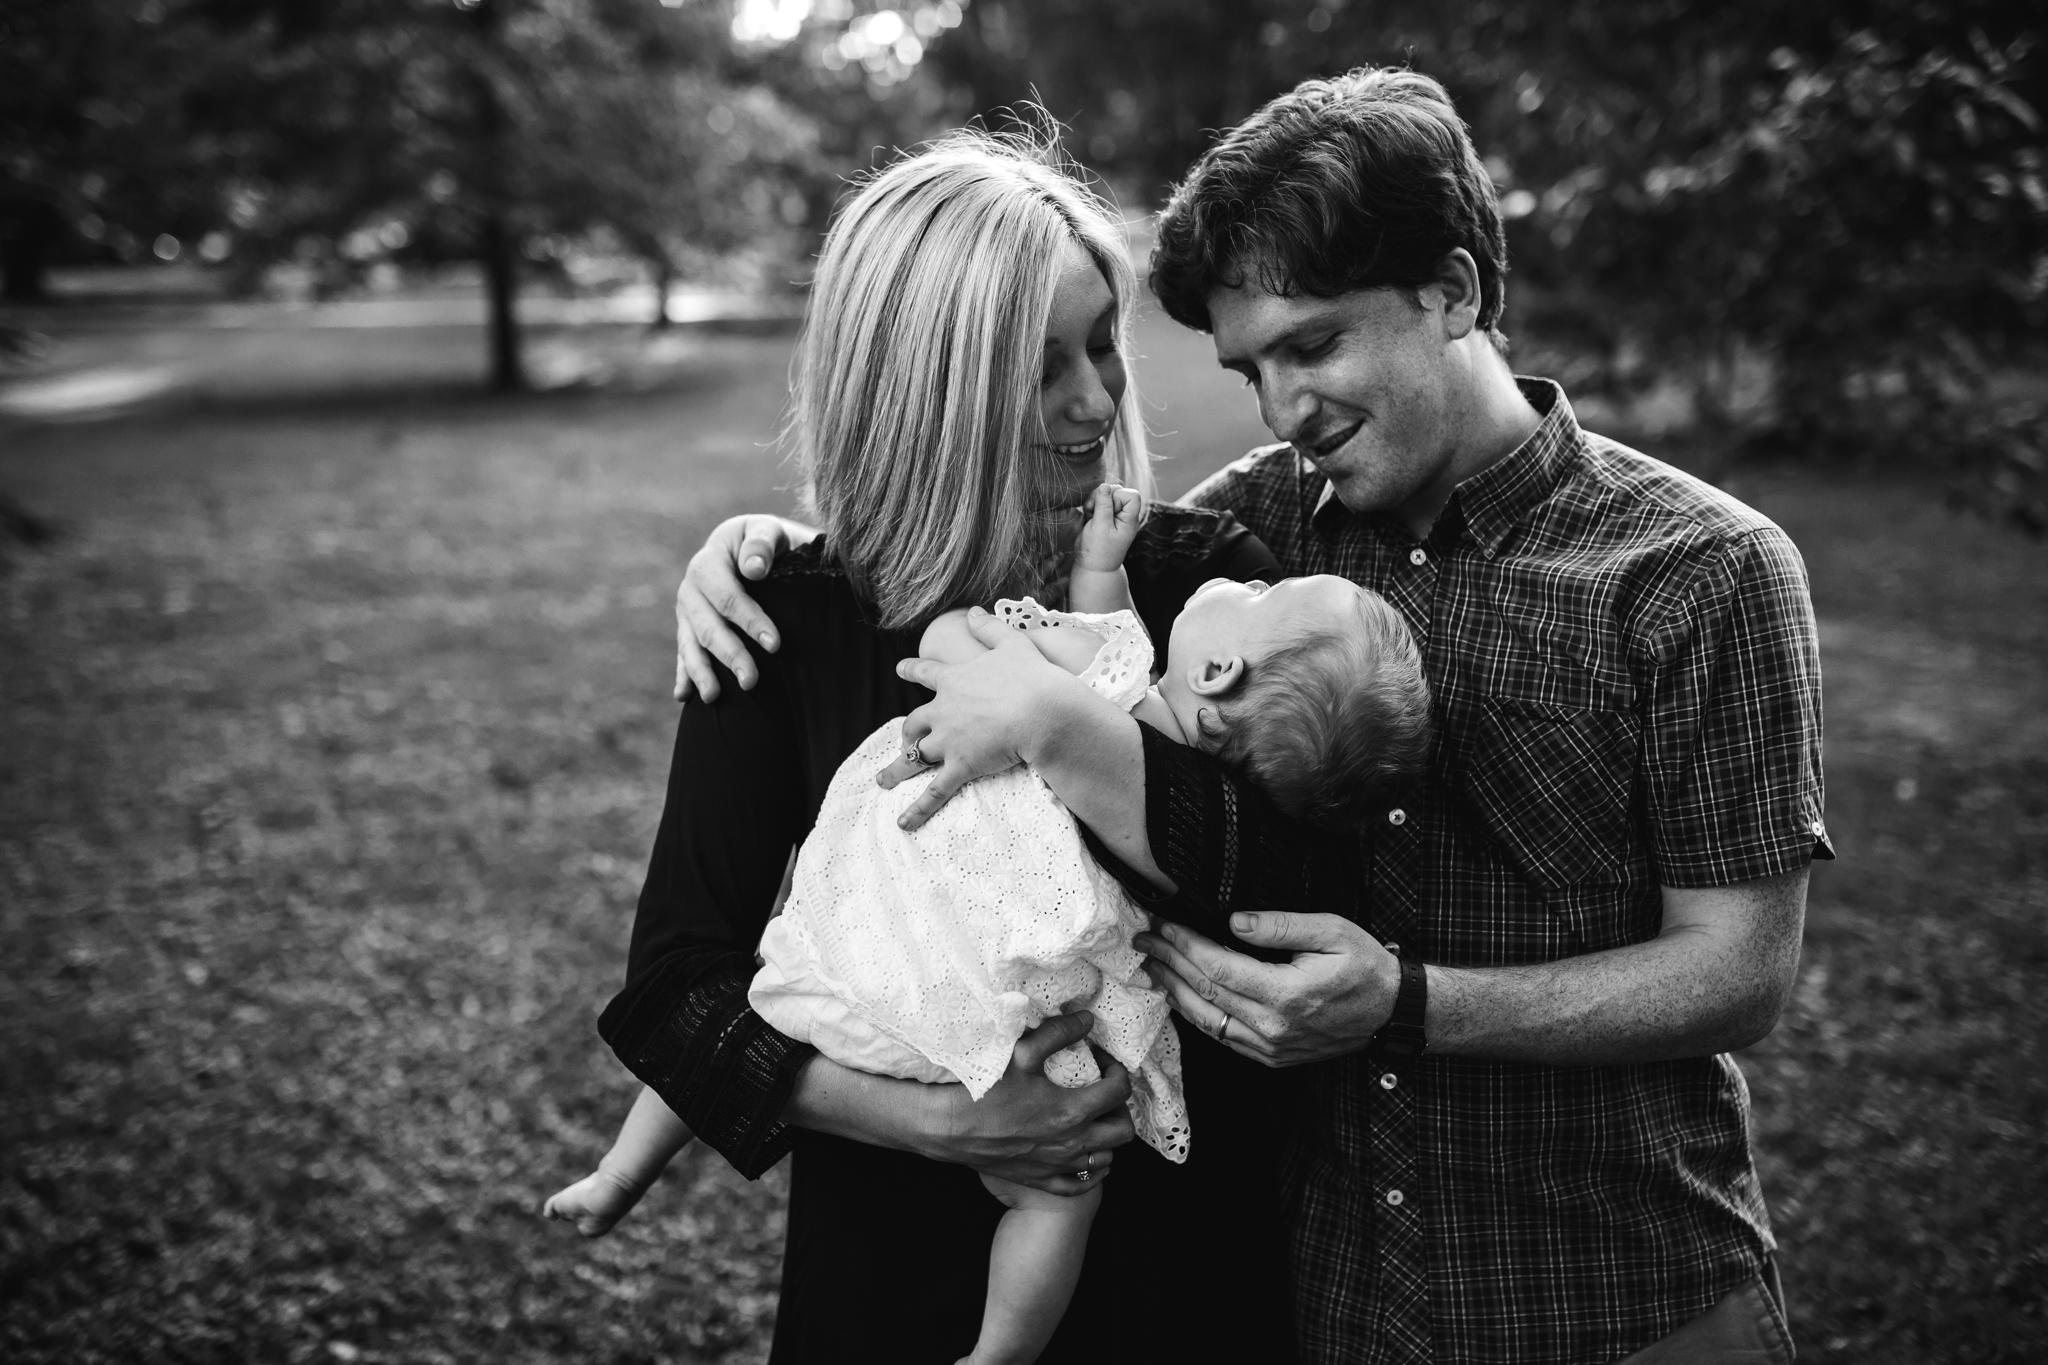 memphis-family-photographer-thewarmtharoundyou-overton-park (7 of 20).jpg